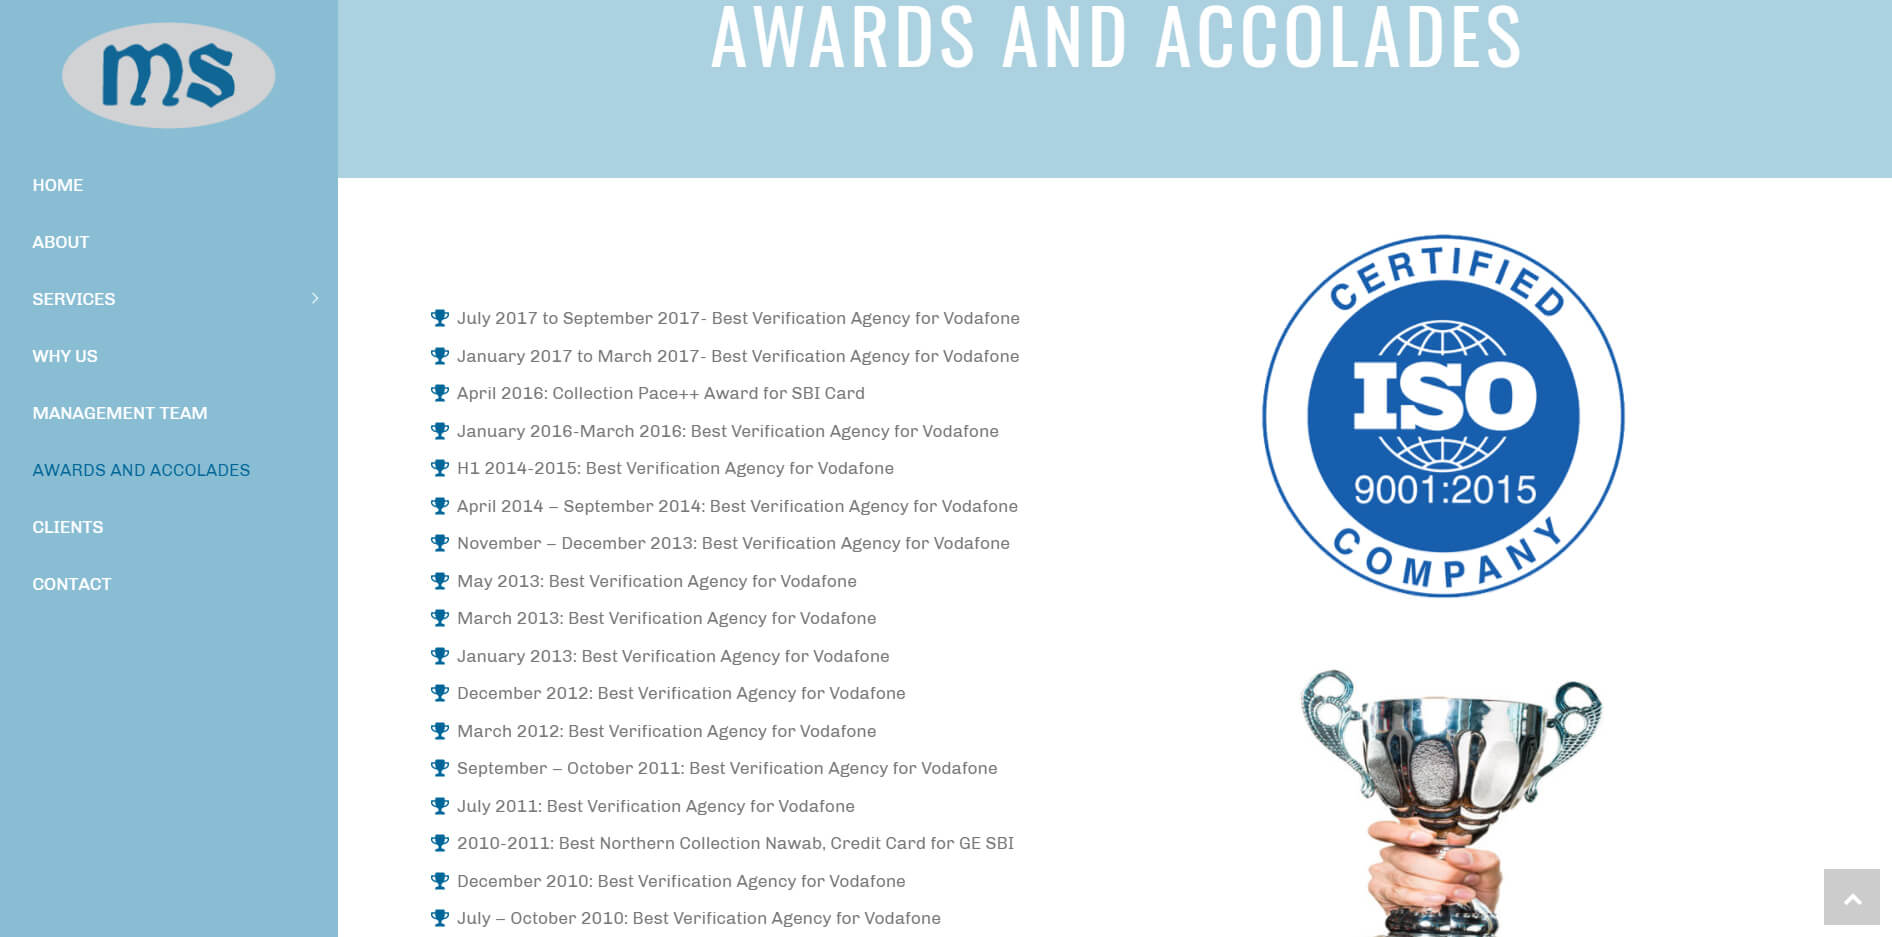 management-services-awards